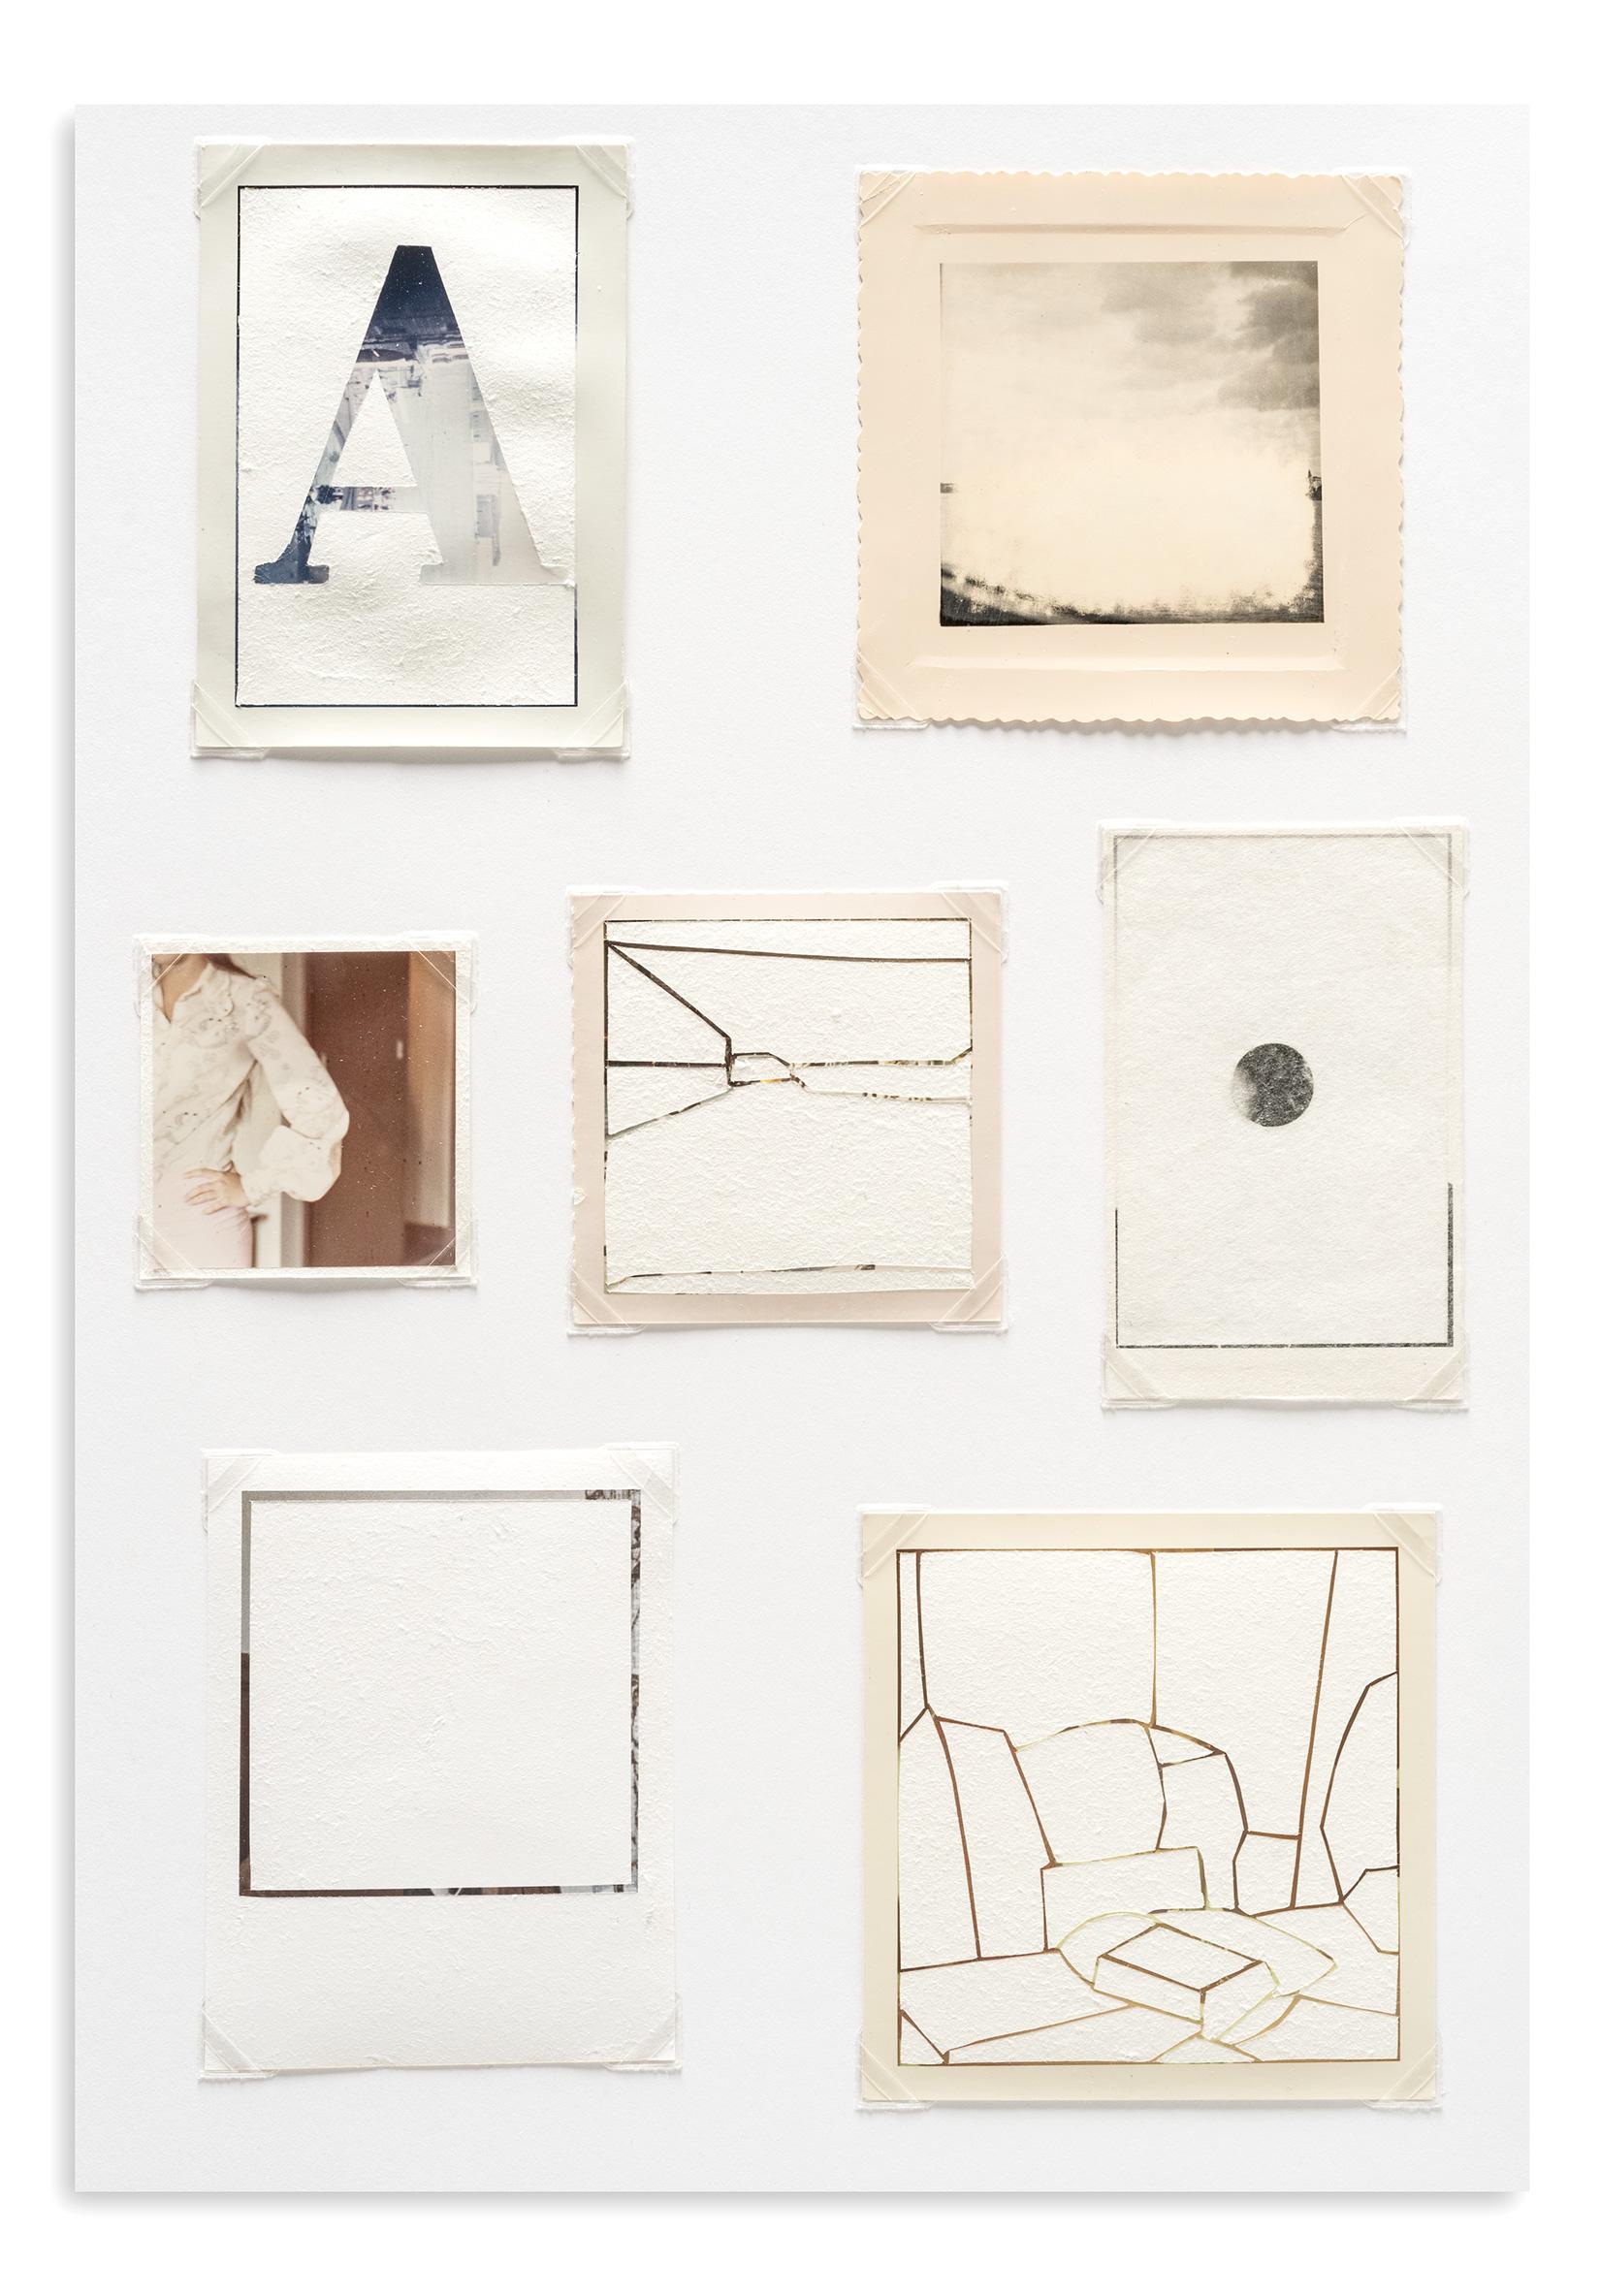 Johanna-Calle-Dibujos-10.jpg